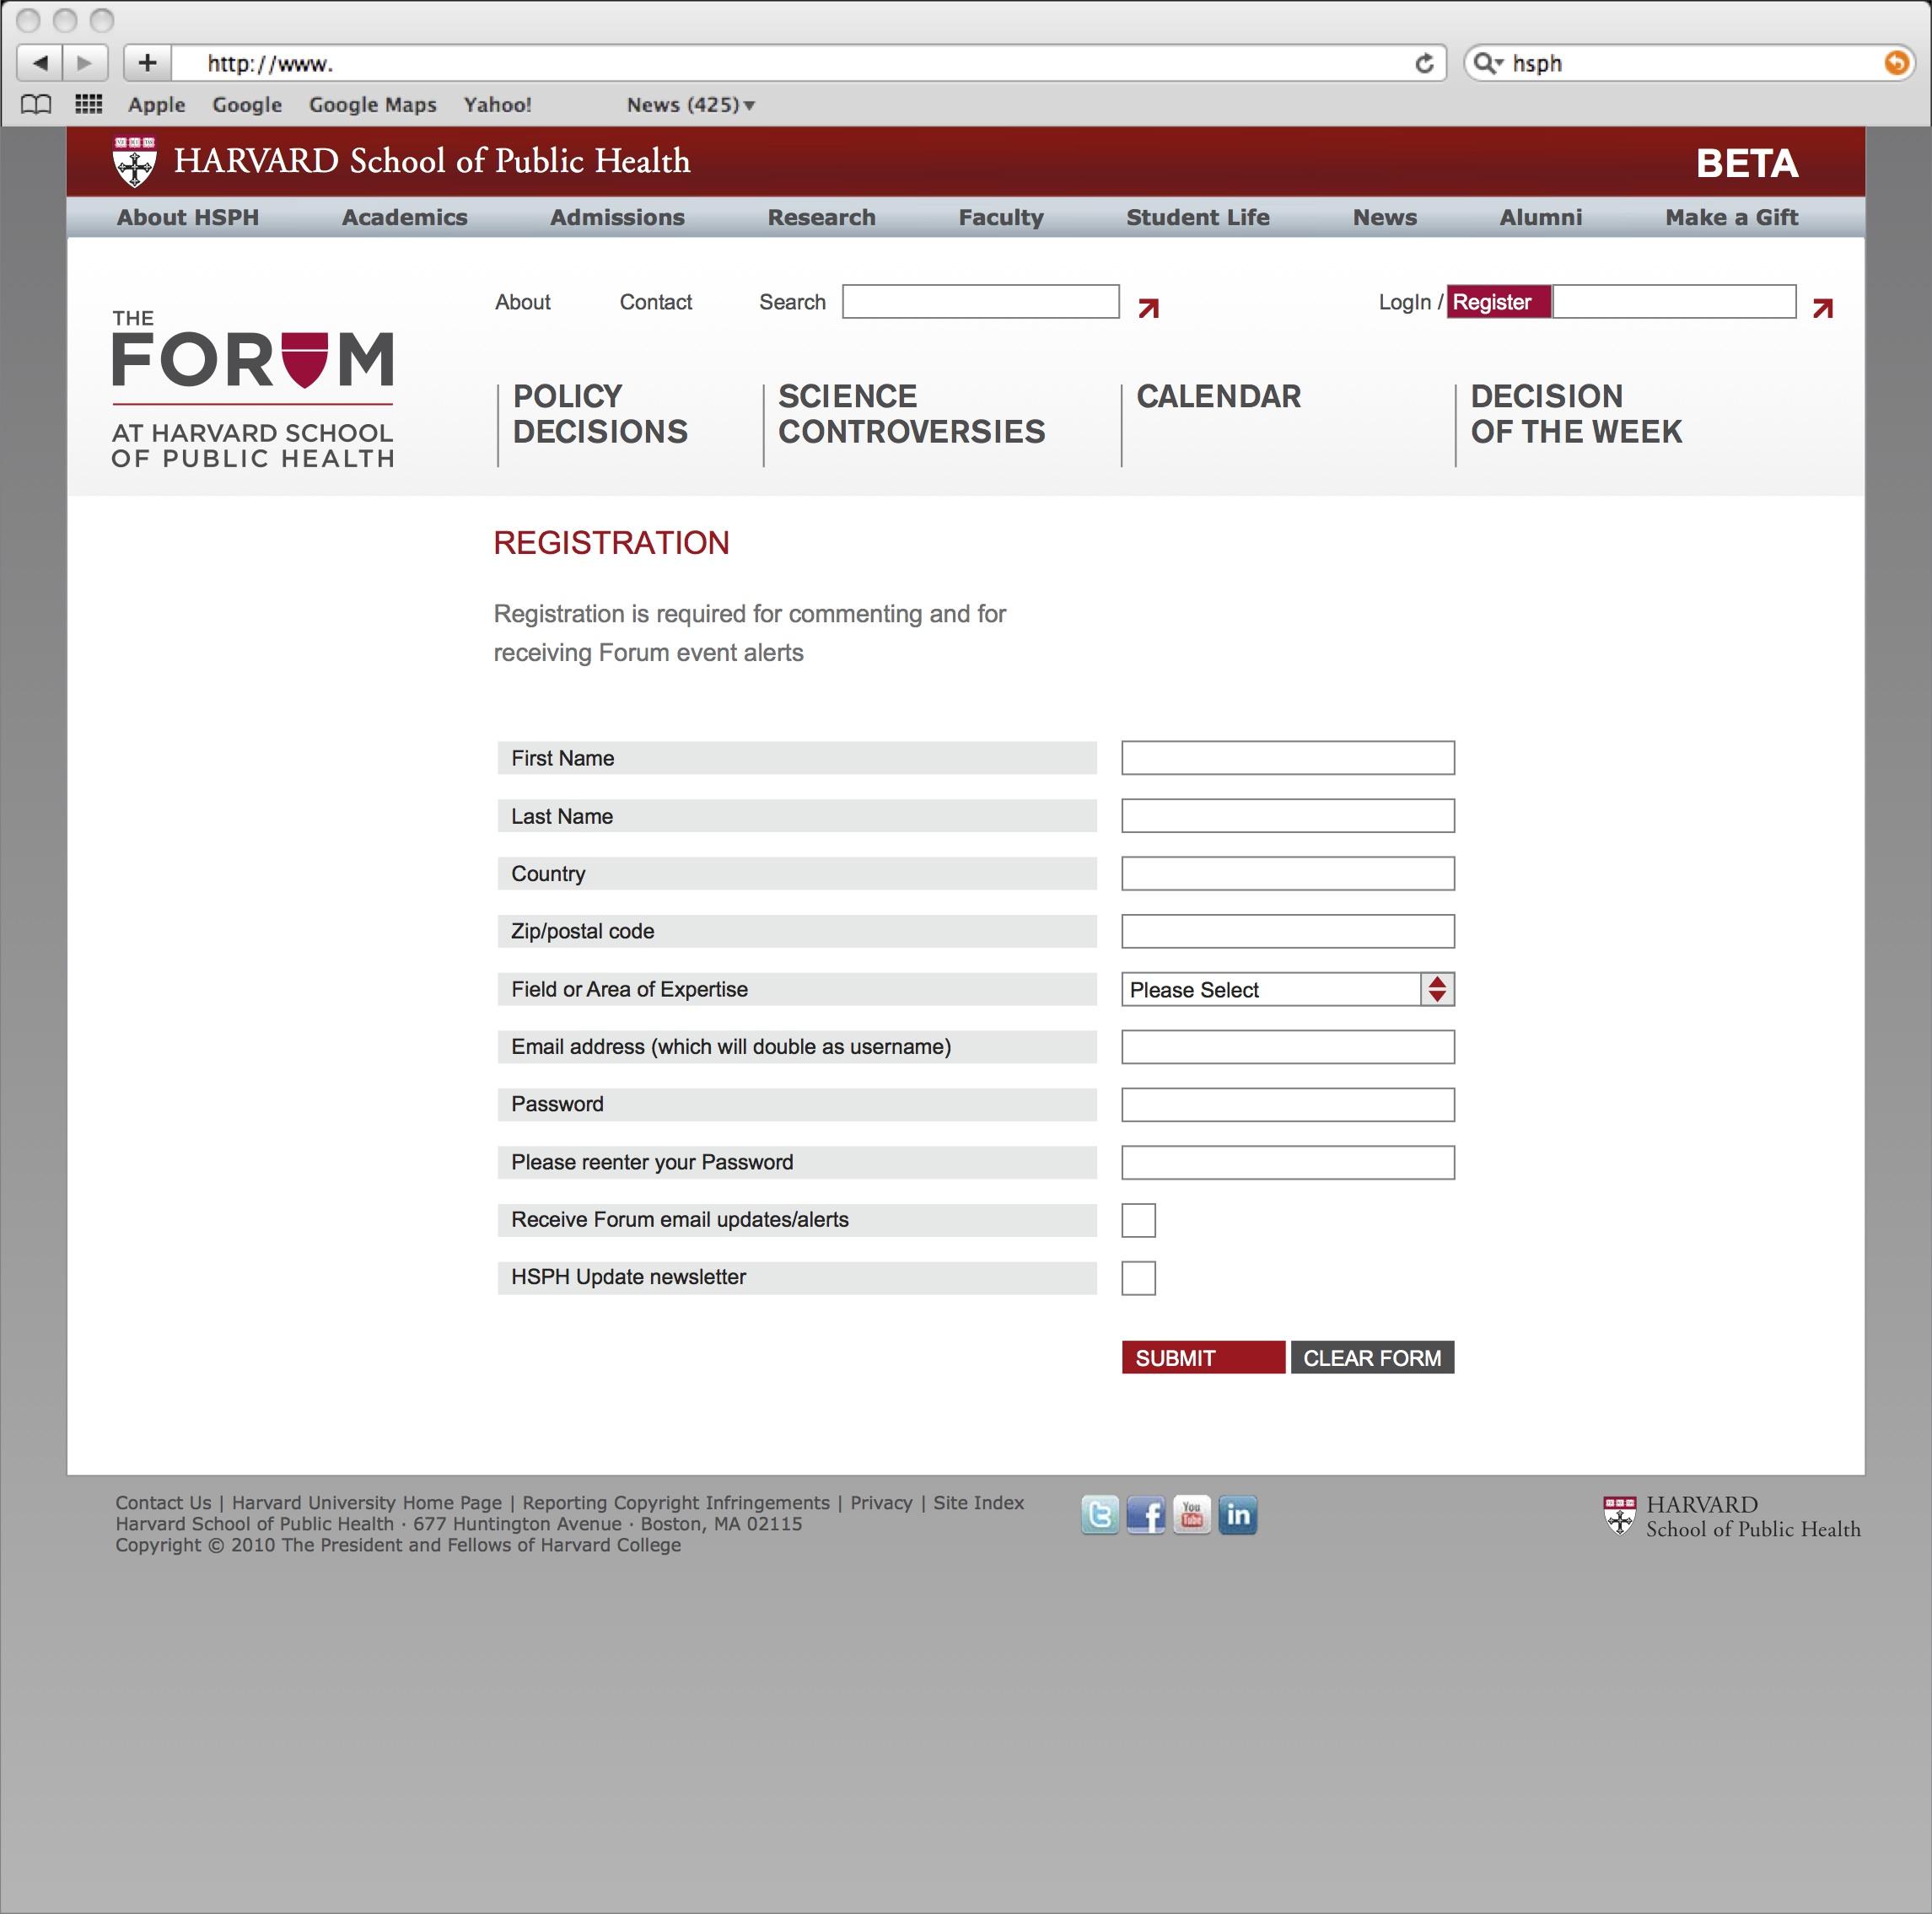 3_FORUM_WEB_4_REGISTRATION_08-20.jpg